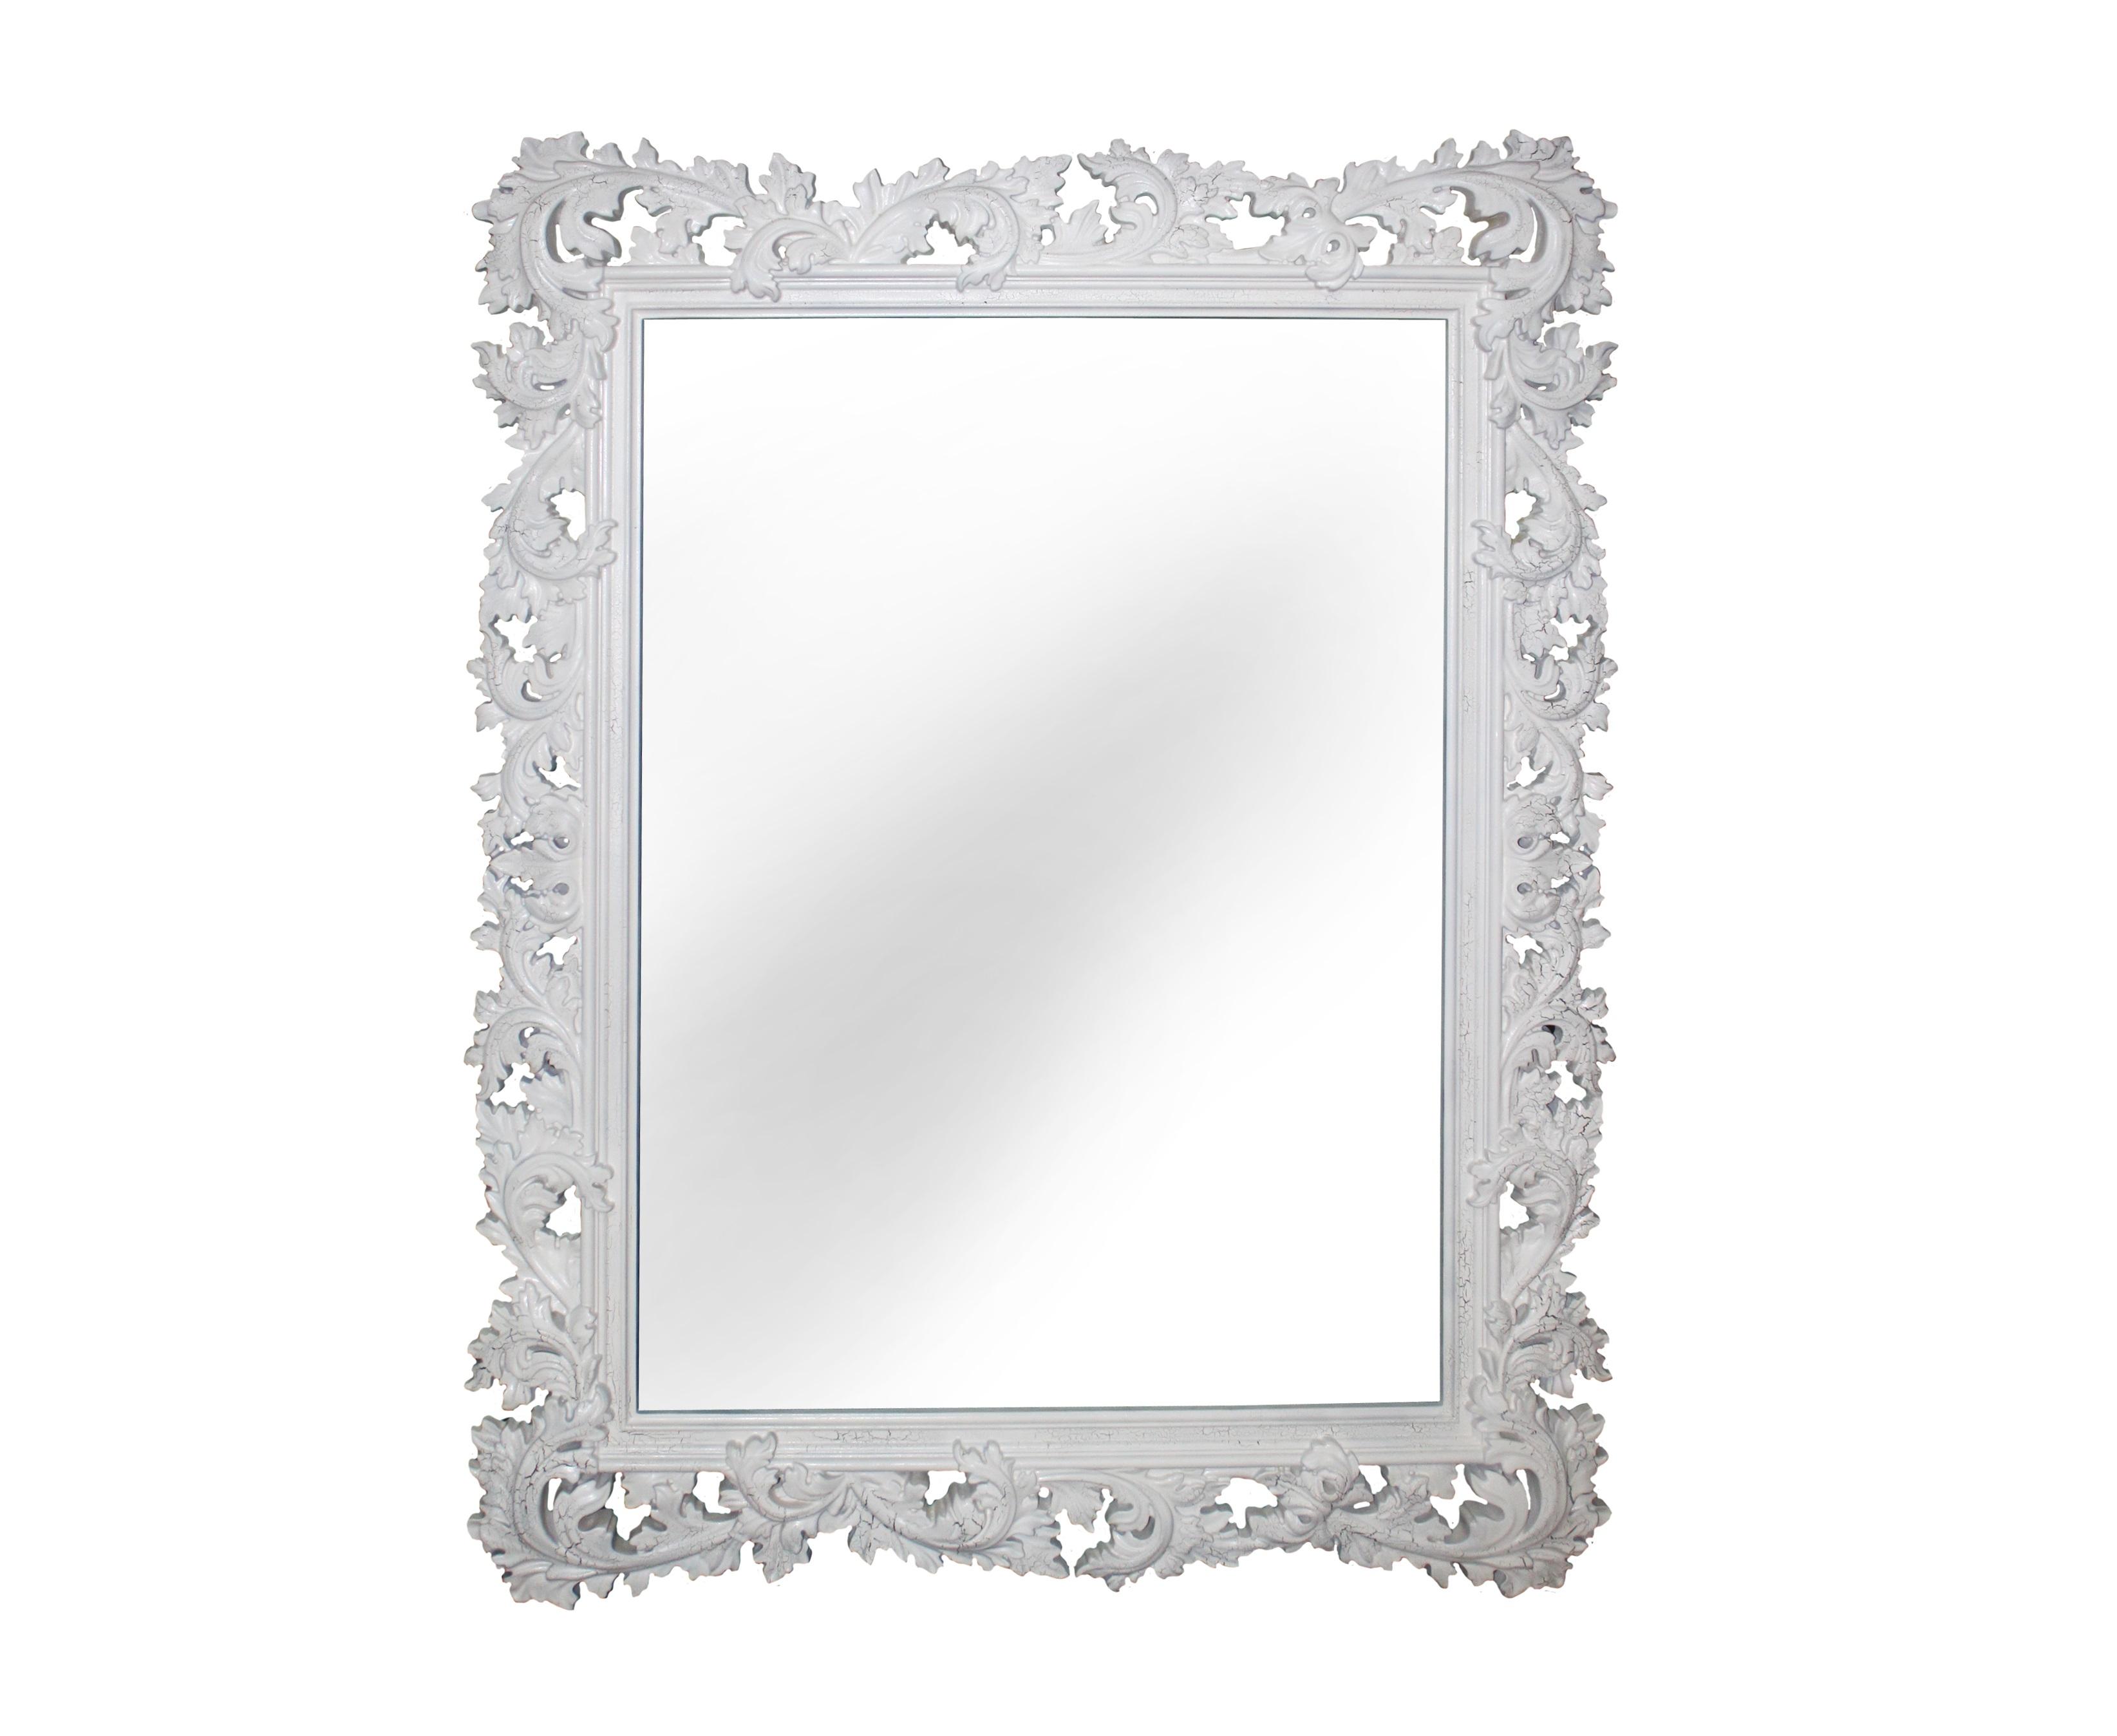 Зеркало АлианаНастенные зеркала<br><br><br>Material: Стекло<br>Ширина см: 88<br>Высота см: 115<br>Глубина см: 4